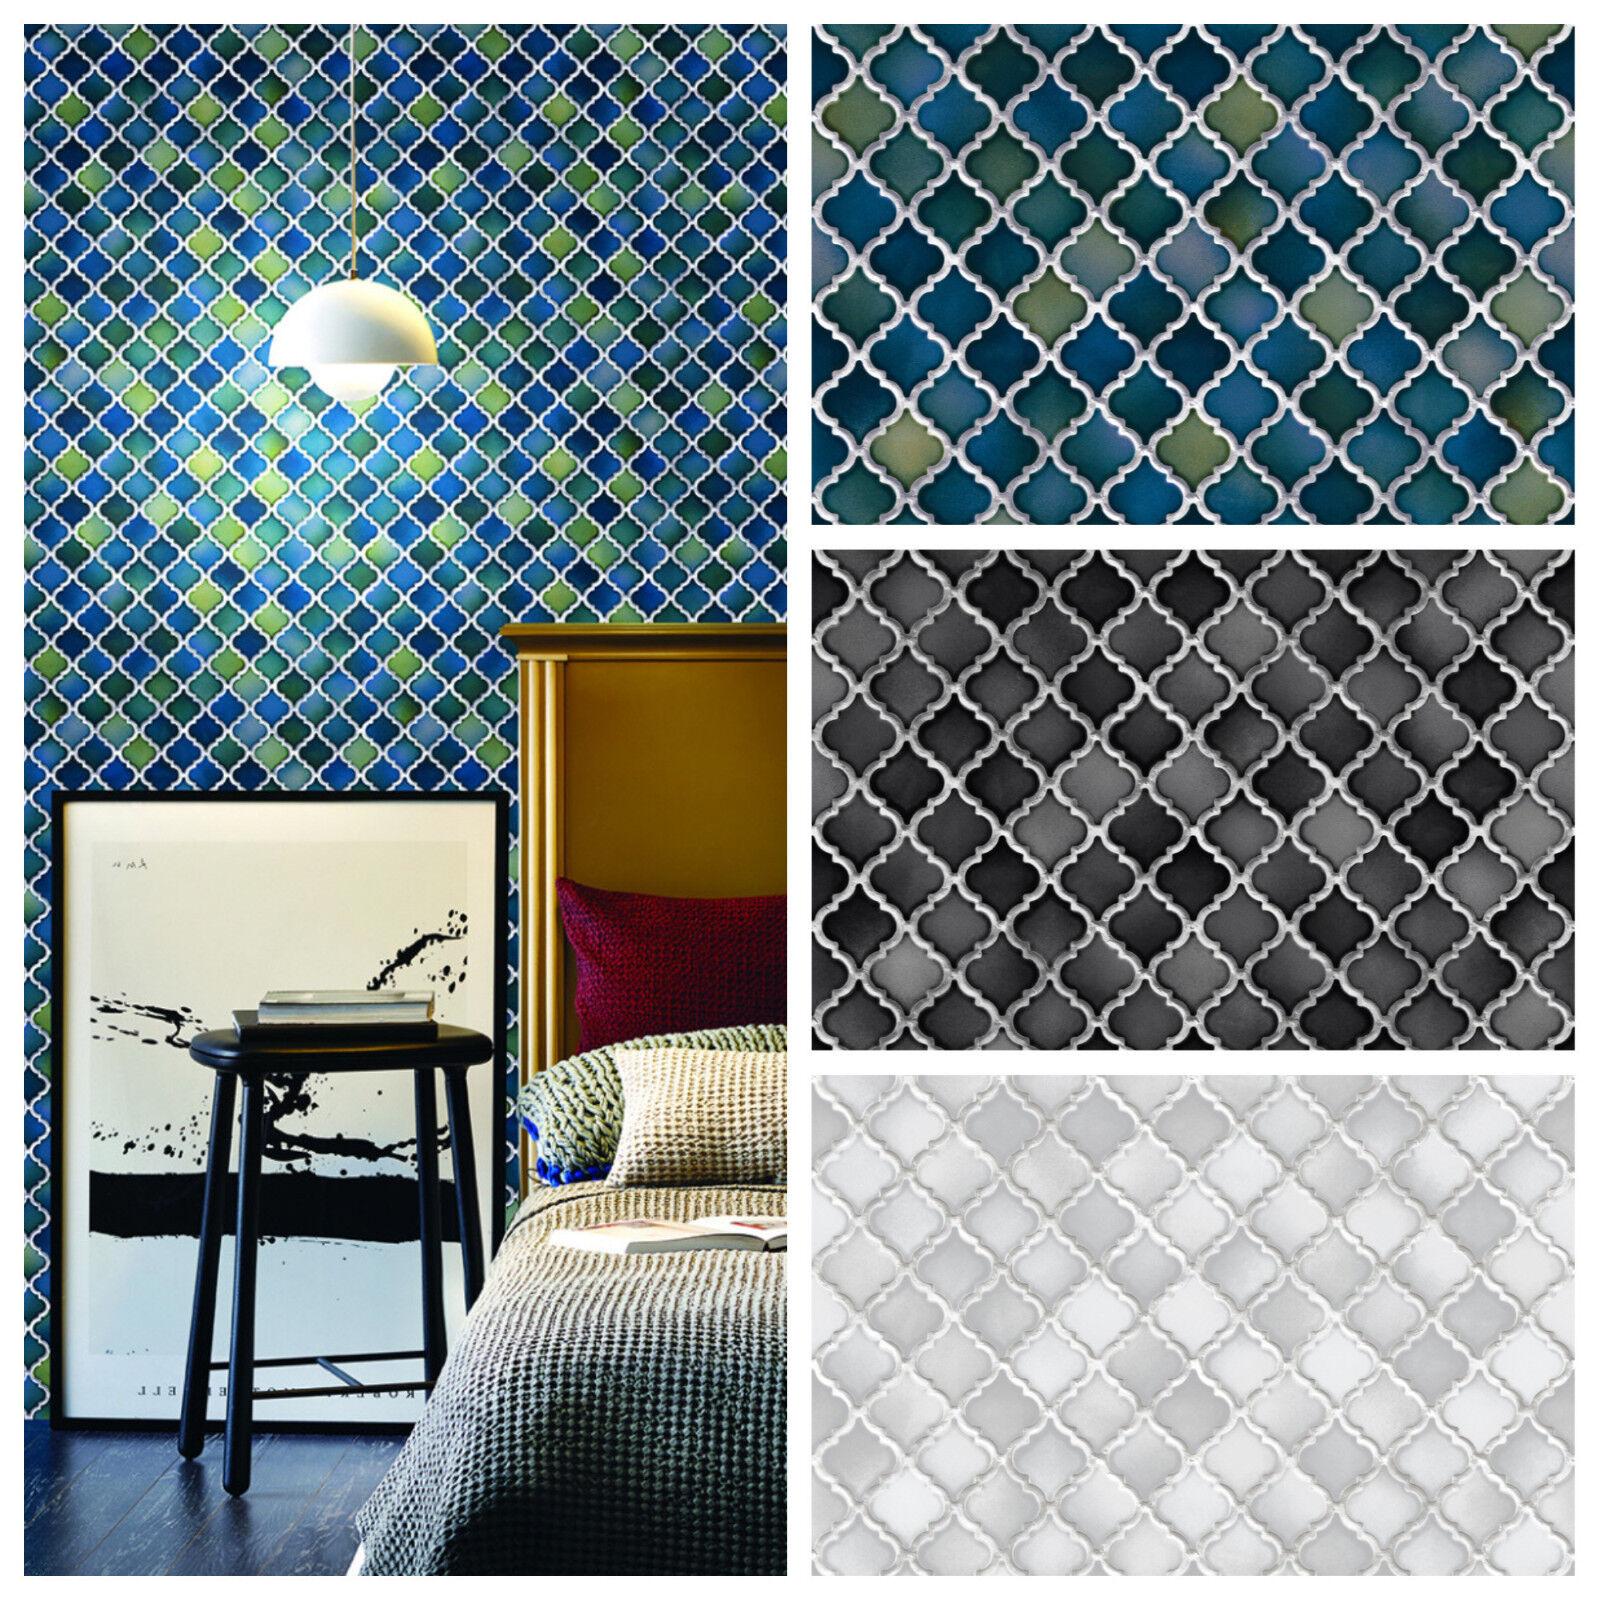 Vlies Tapete Stein Keramik Mosaik Fliesen Florentiner Optik Petrol Schwarz  Grau 1 ...